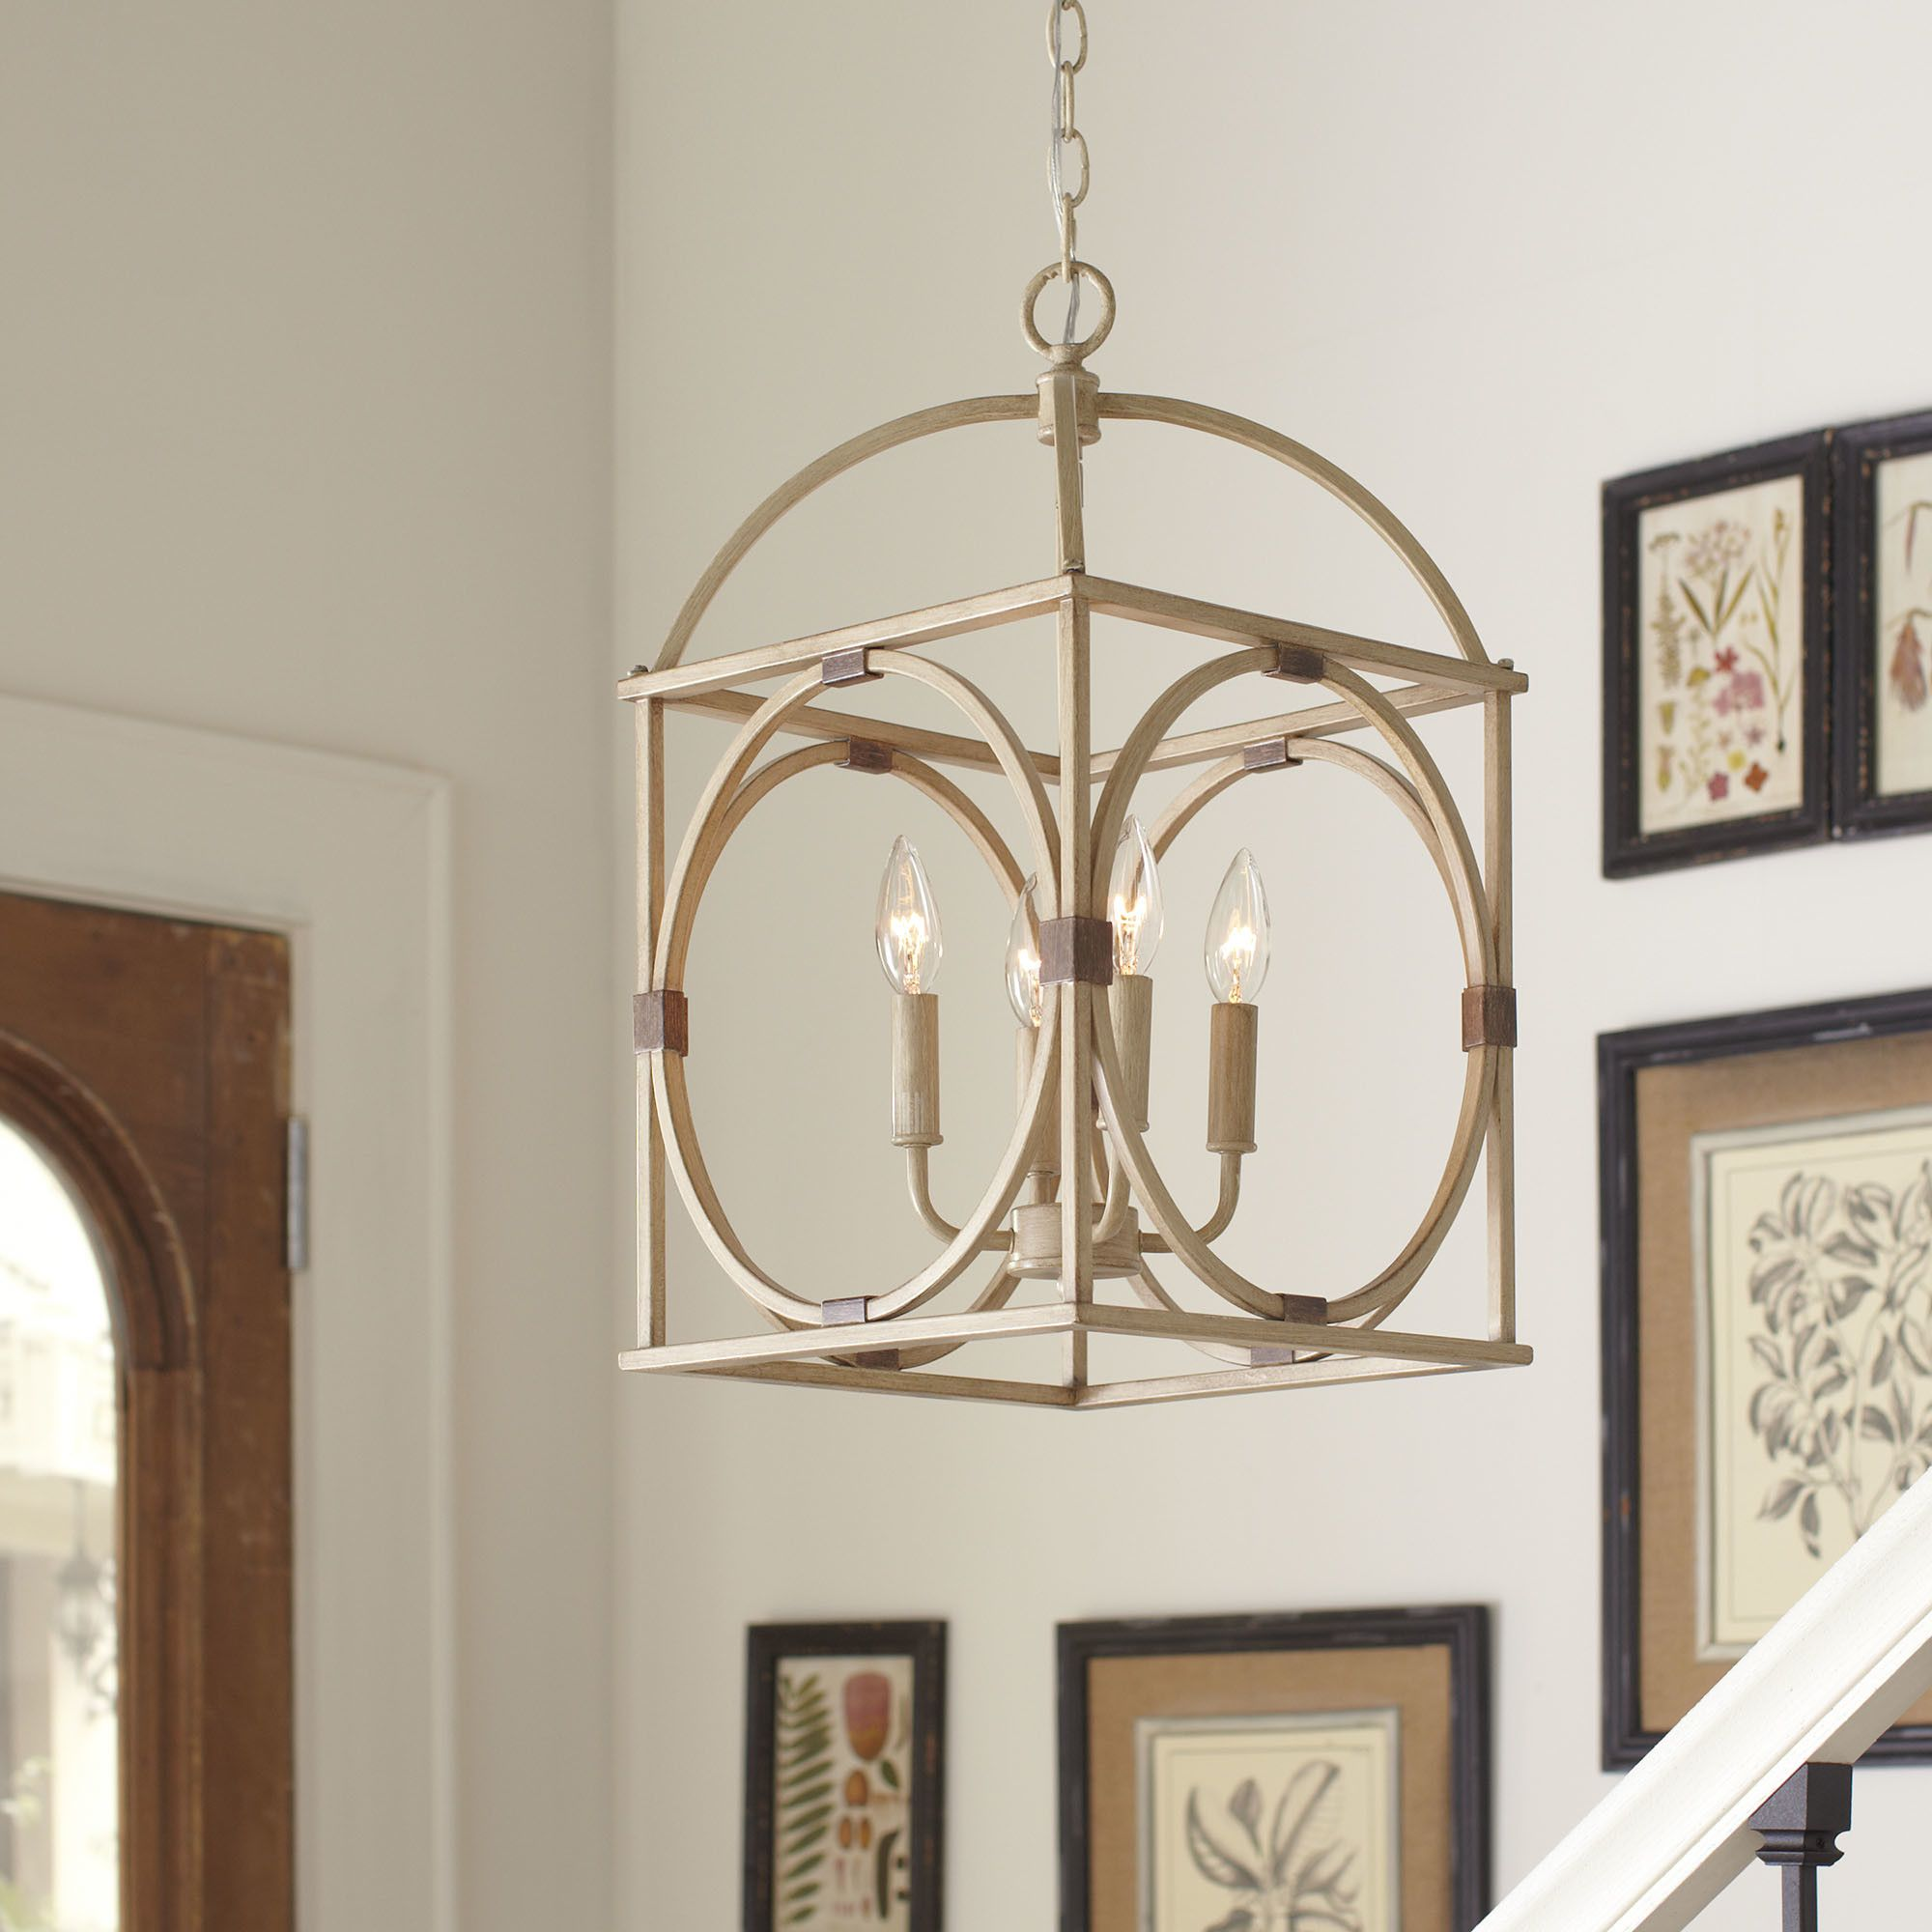 Birch Lane Loraine Light CandleStyle Chandelier Project - Kitchen light fixtures wayfair